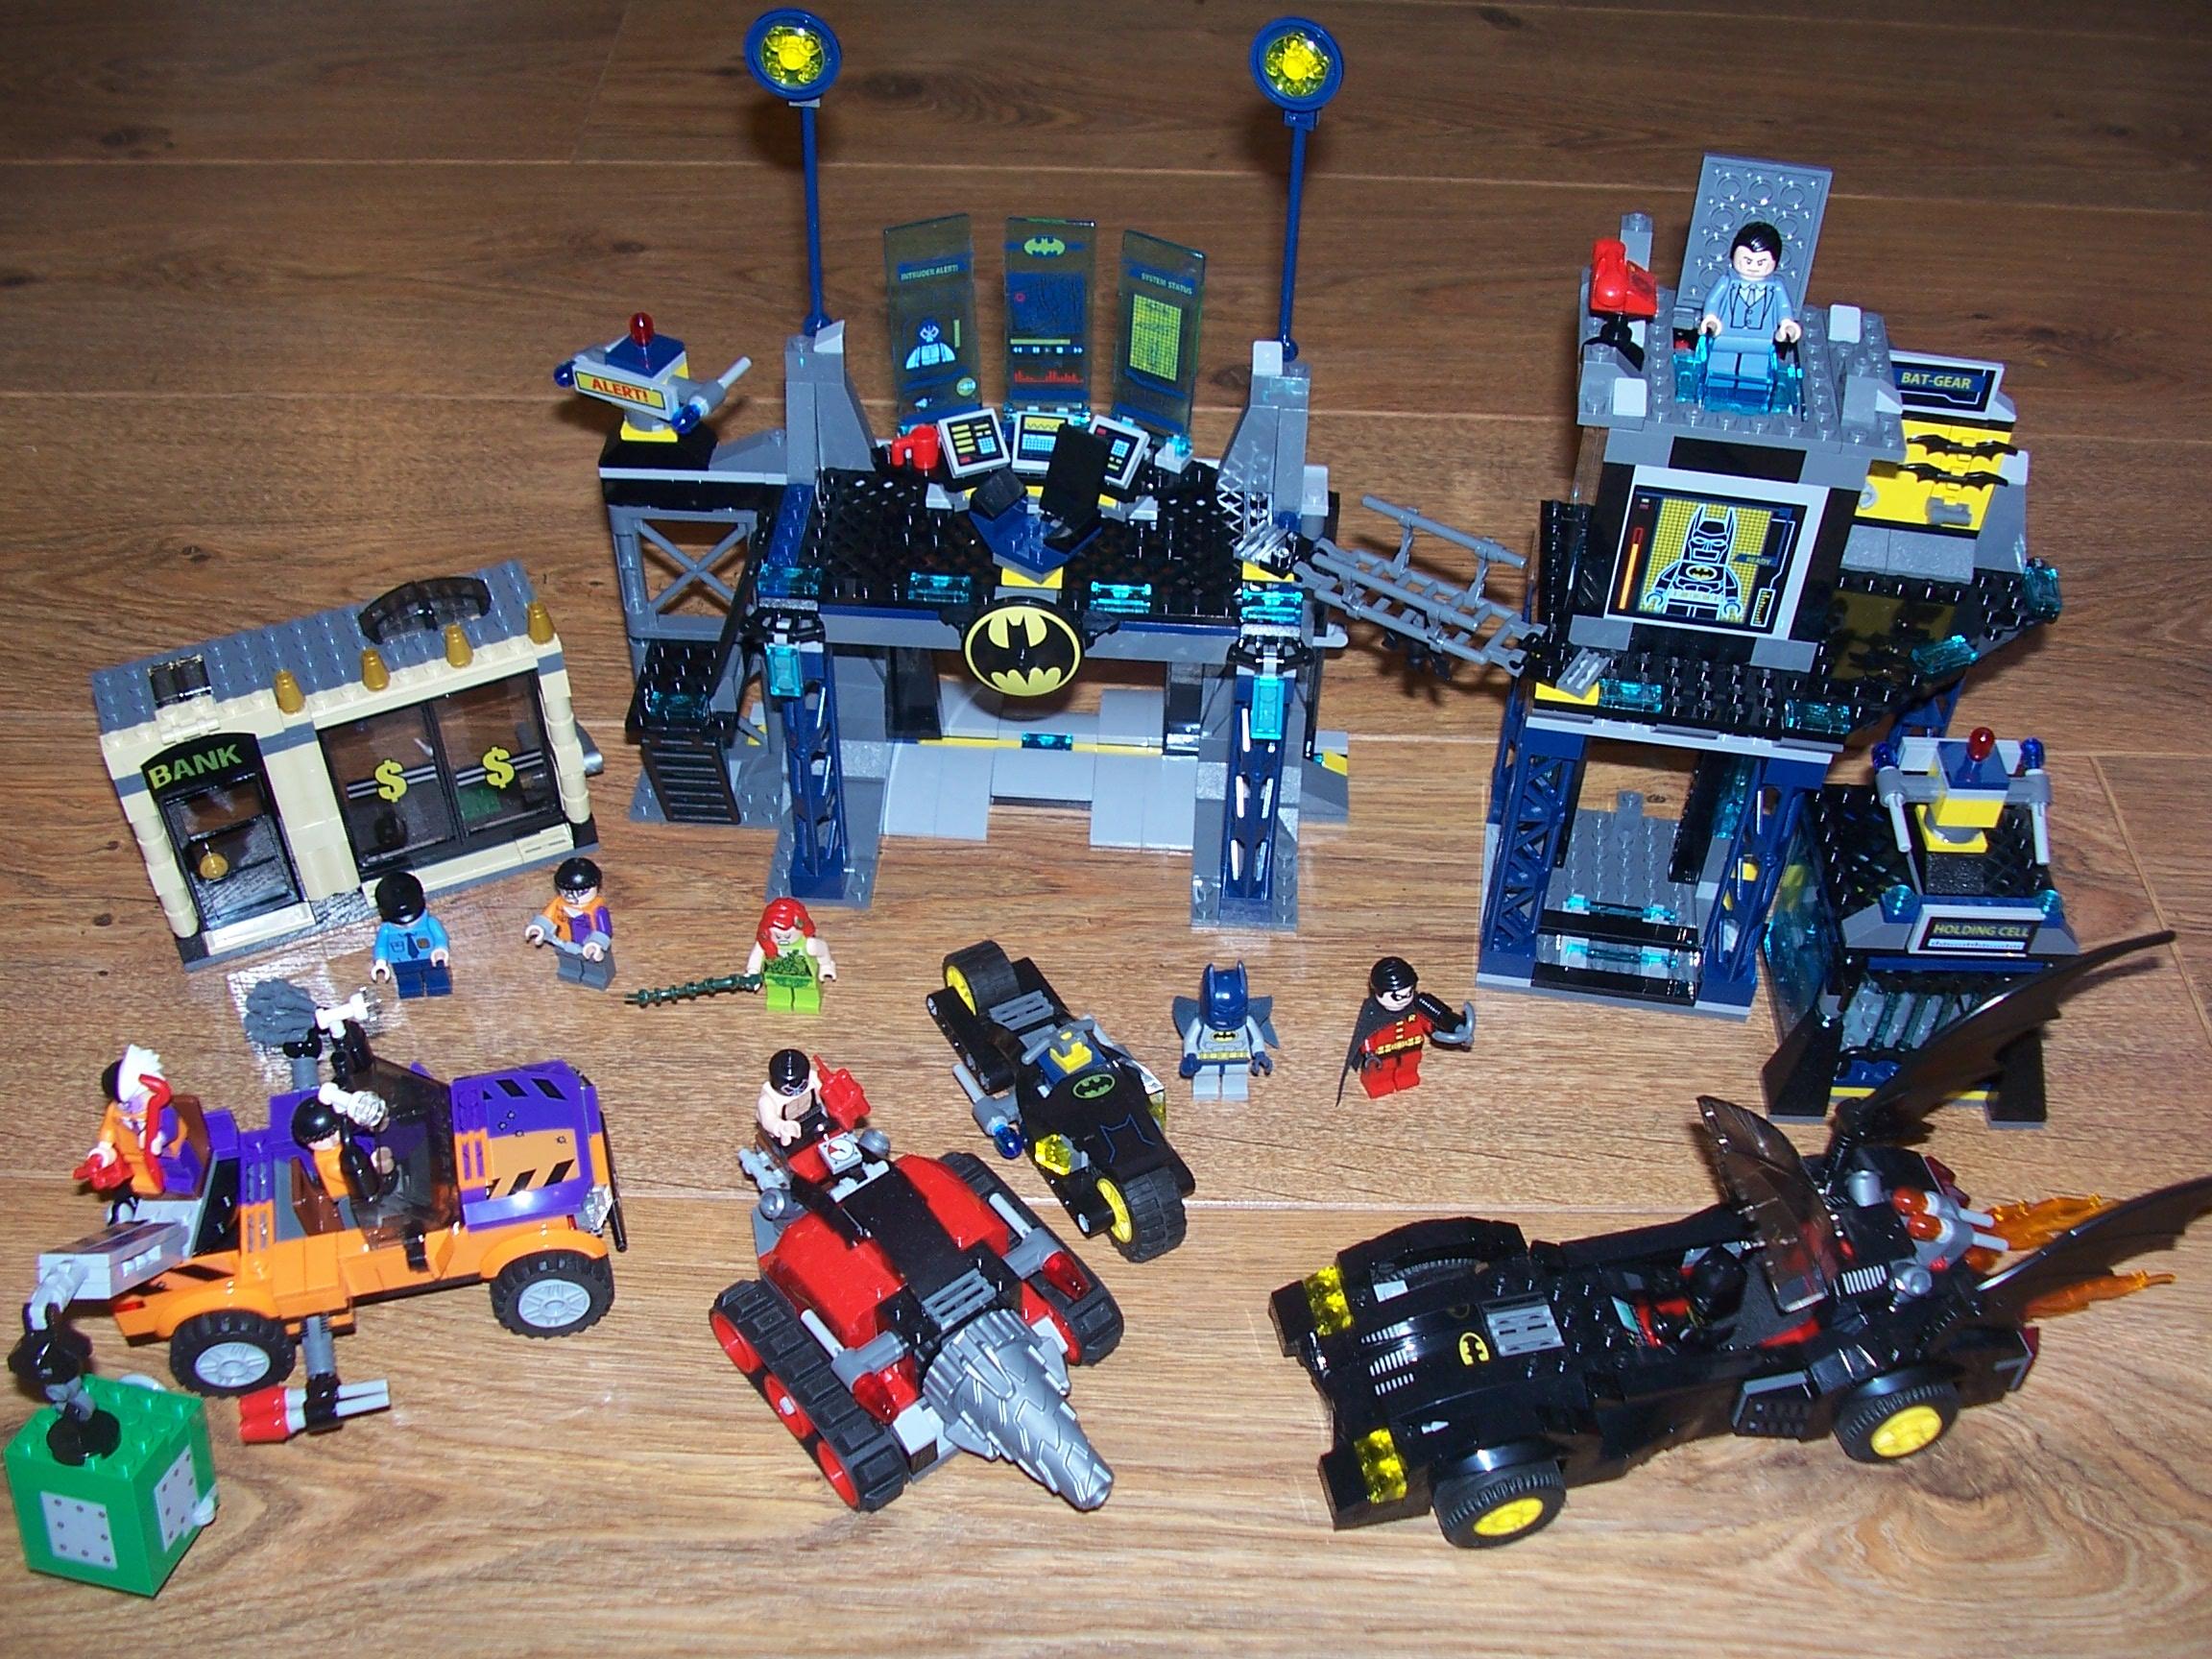 Lego batman 2 dc super heroes video game and toys for Videos de lego batman